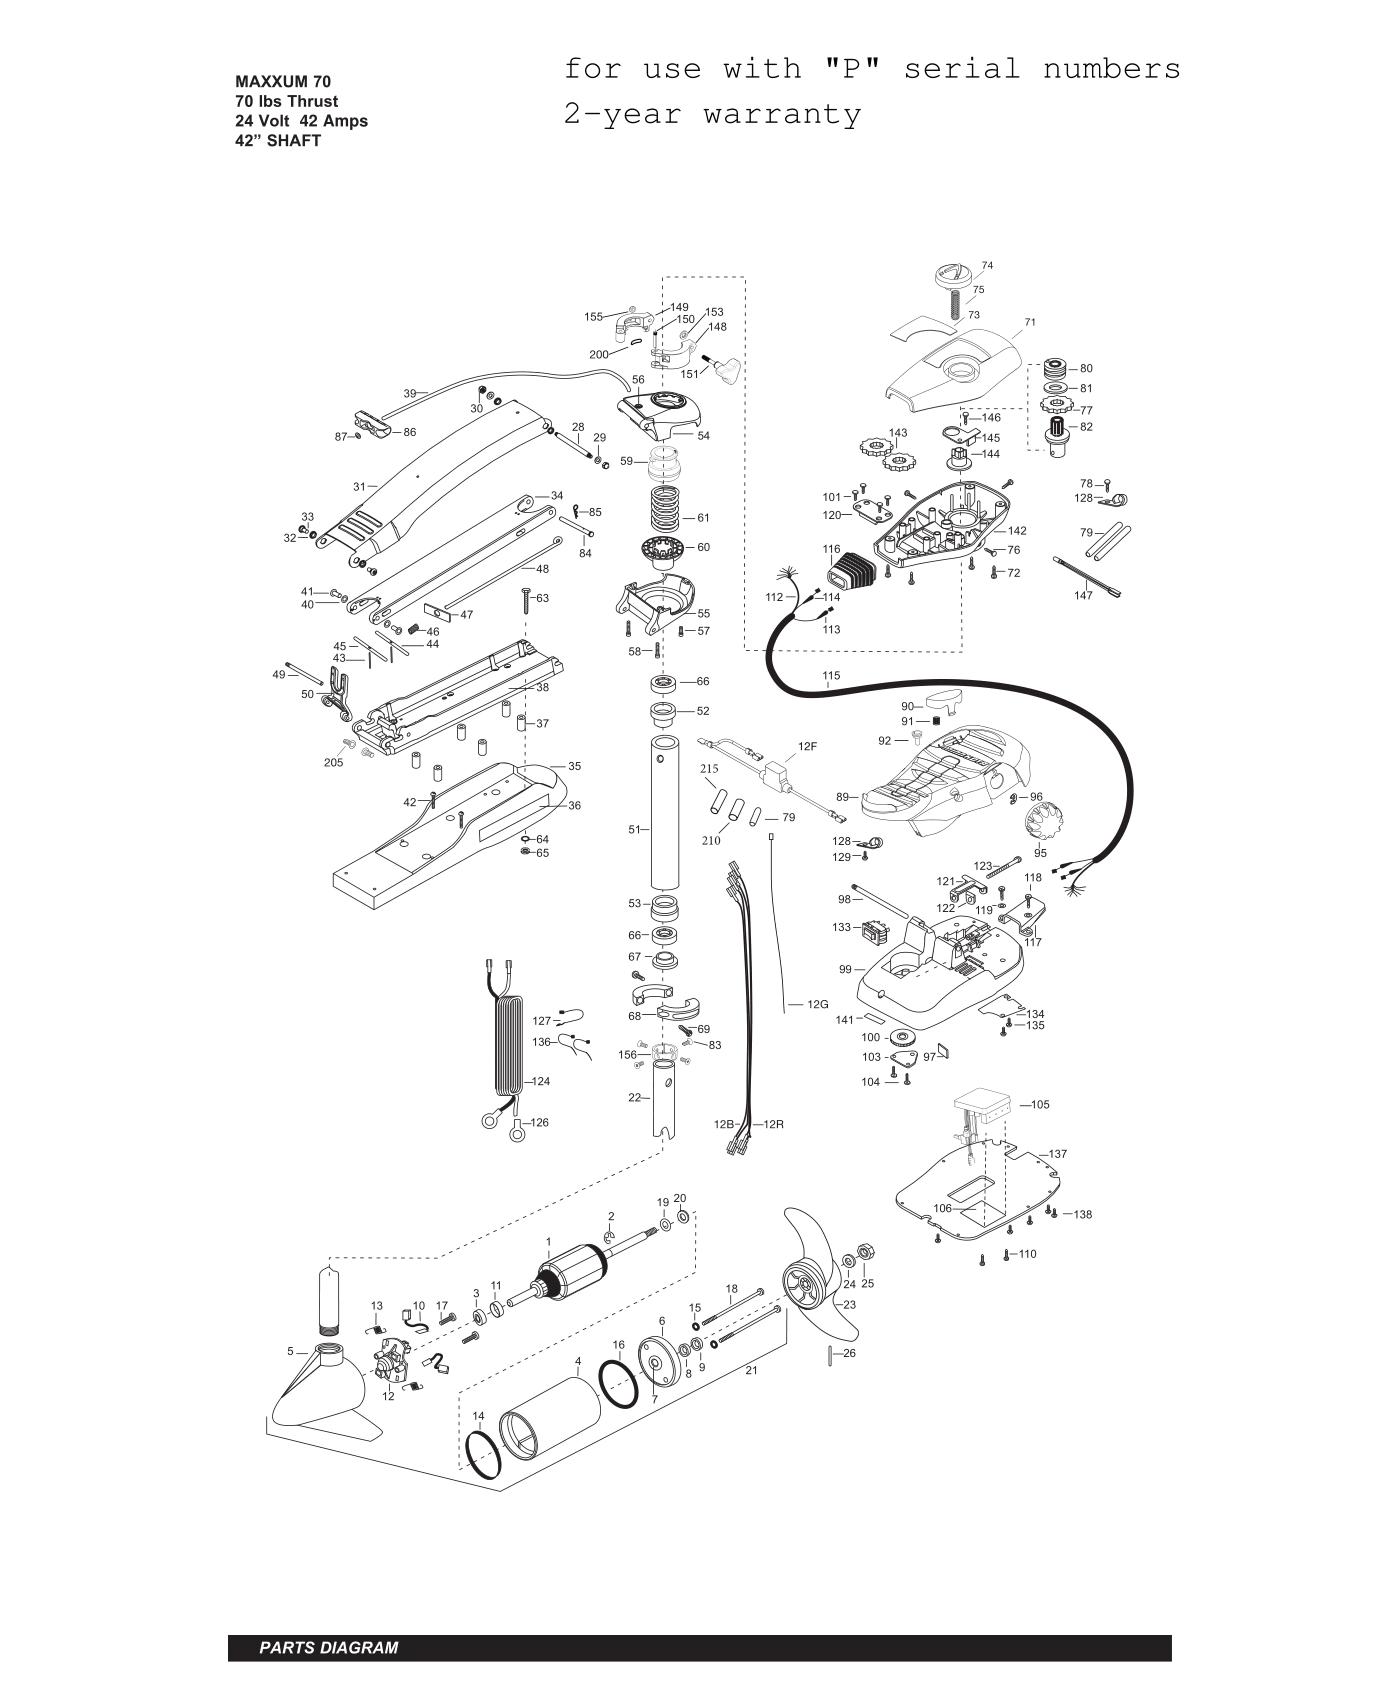 2015-mk-max70-42inch-1.png